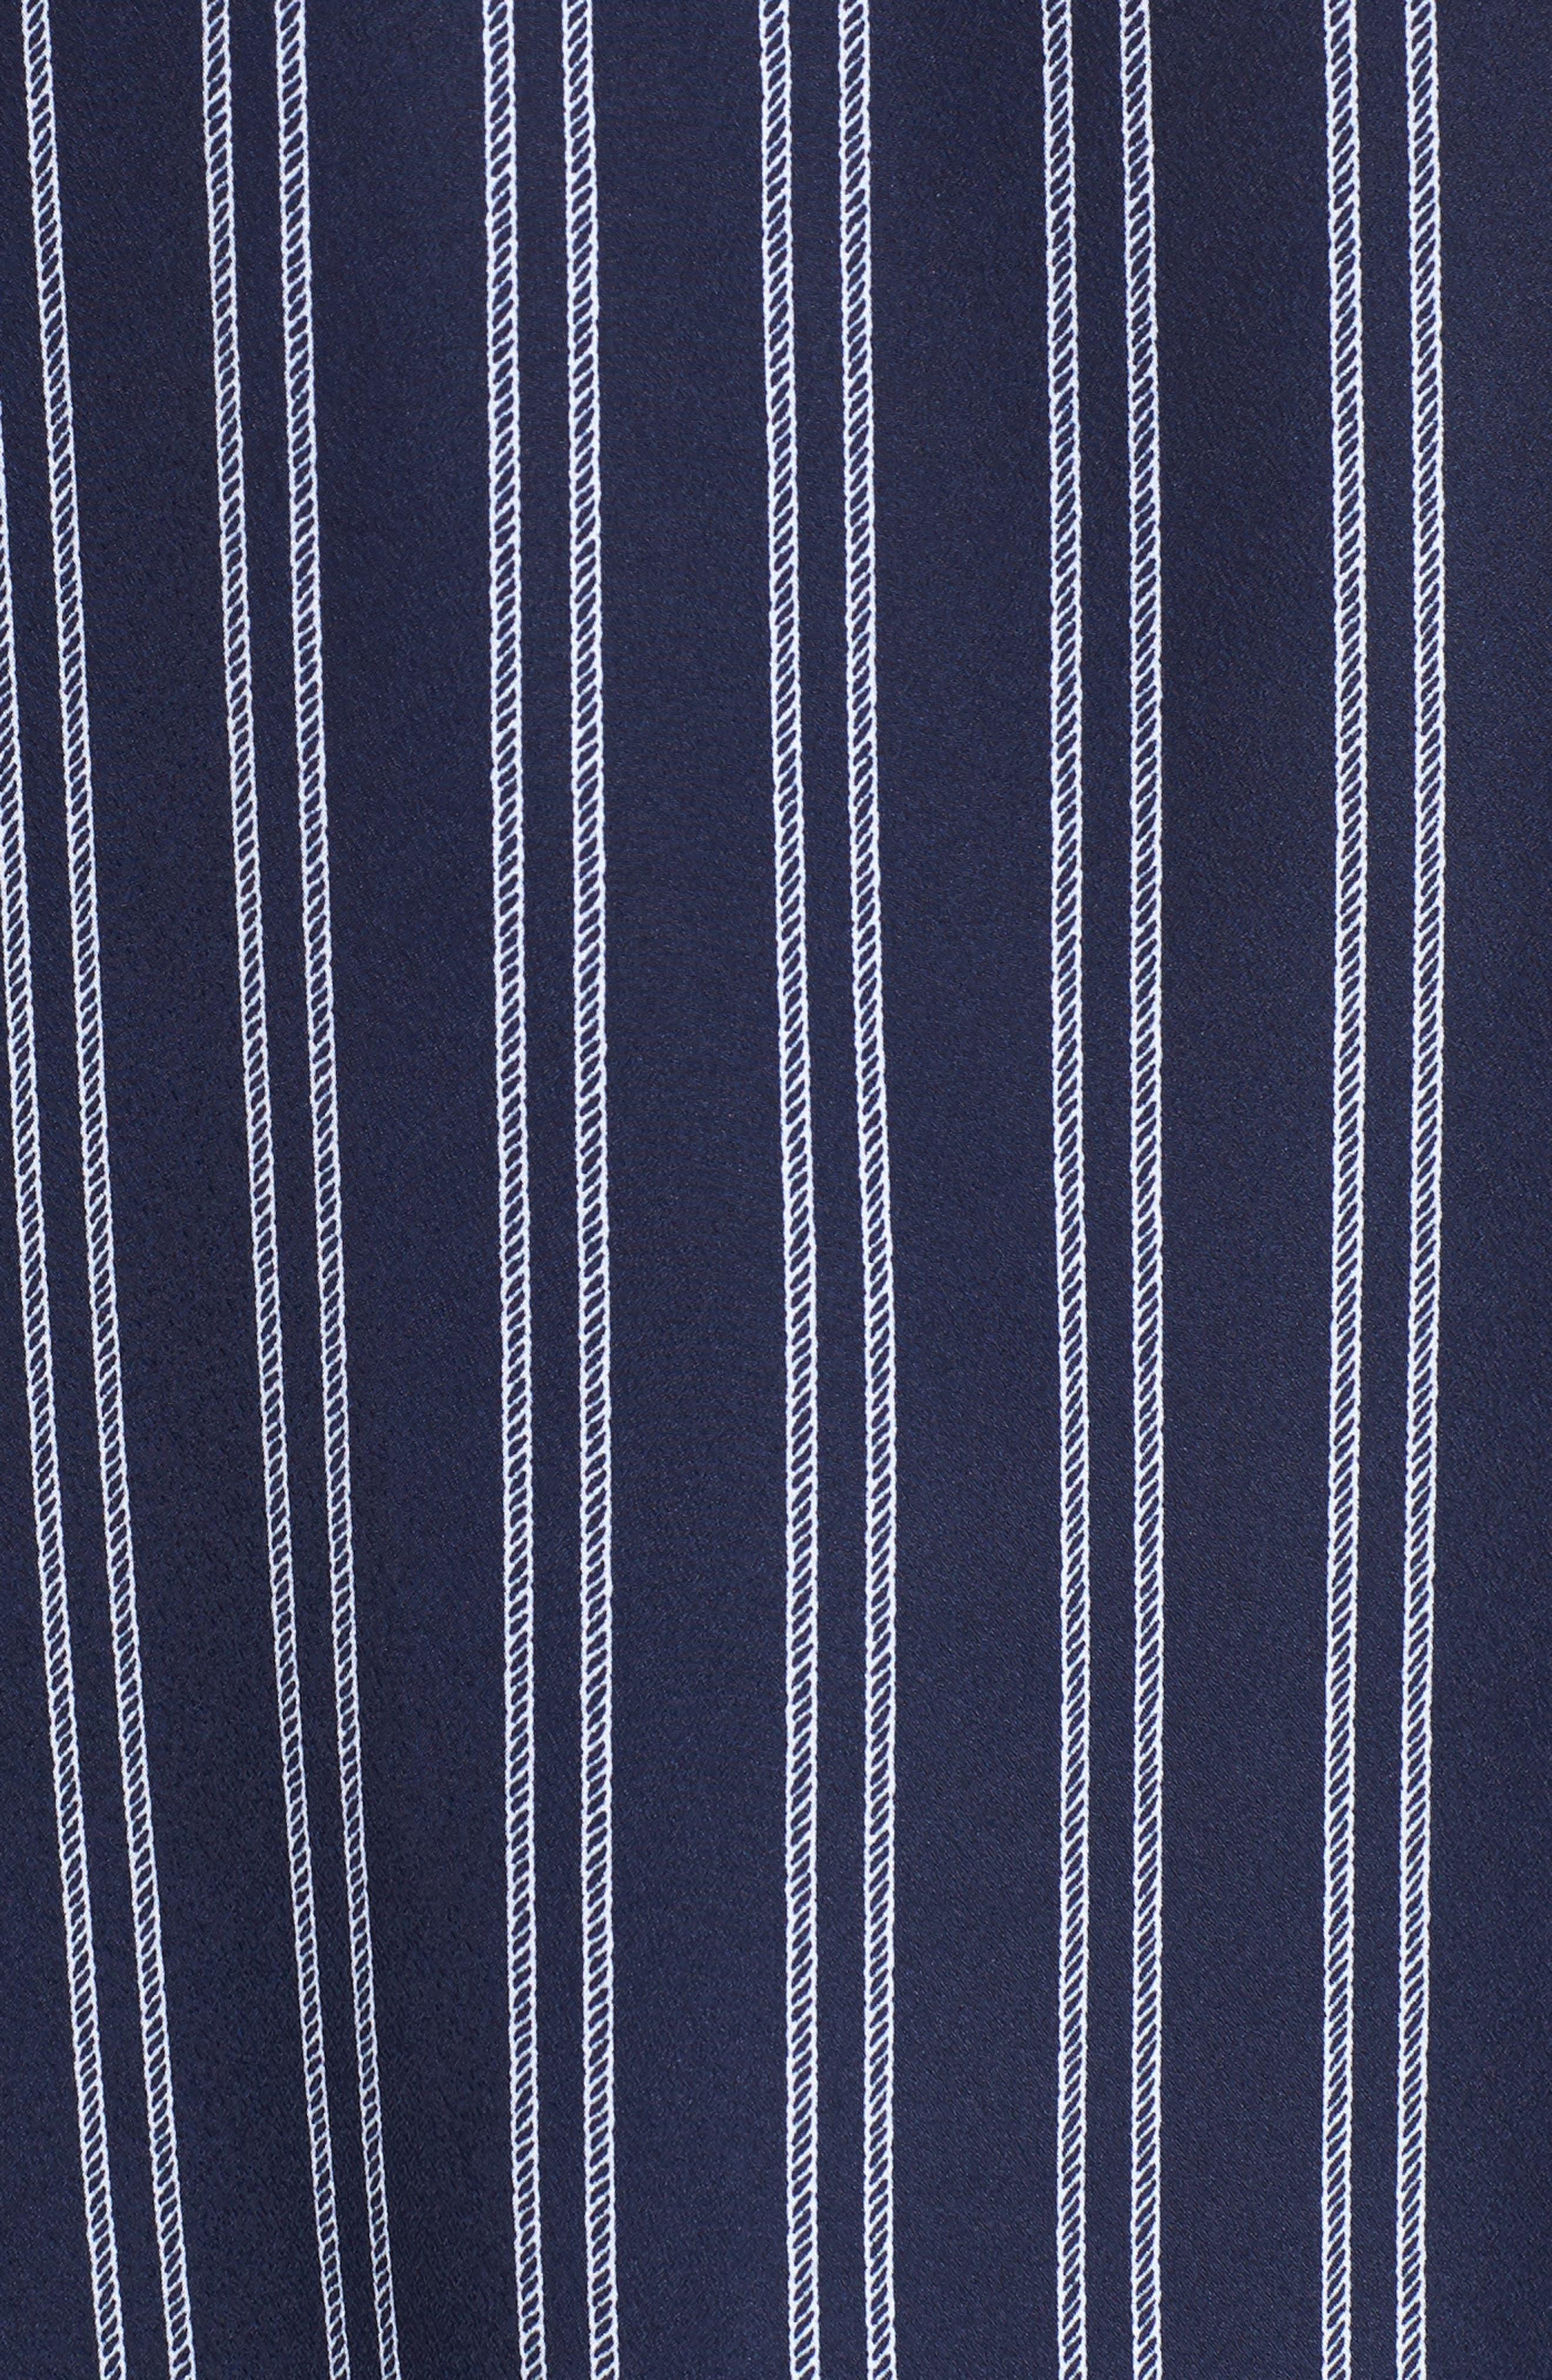 MICHAEL Michael Kors Bengal Striped Shirt,                             Alternate thumbnail 5, color,                             TRUE NAVY